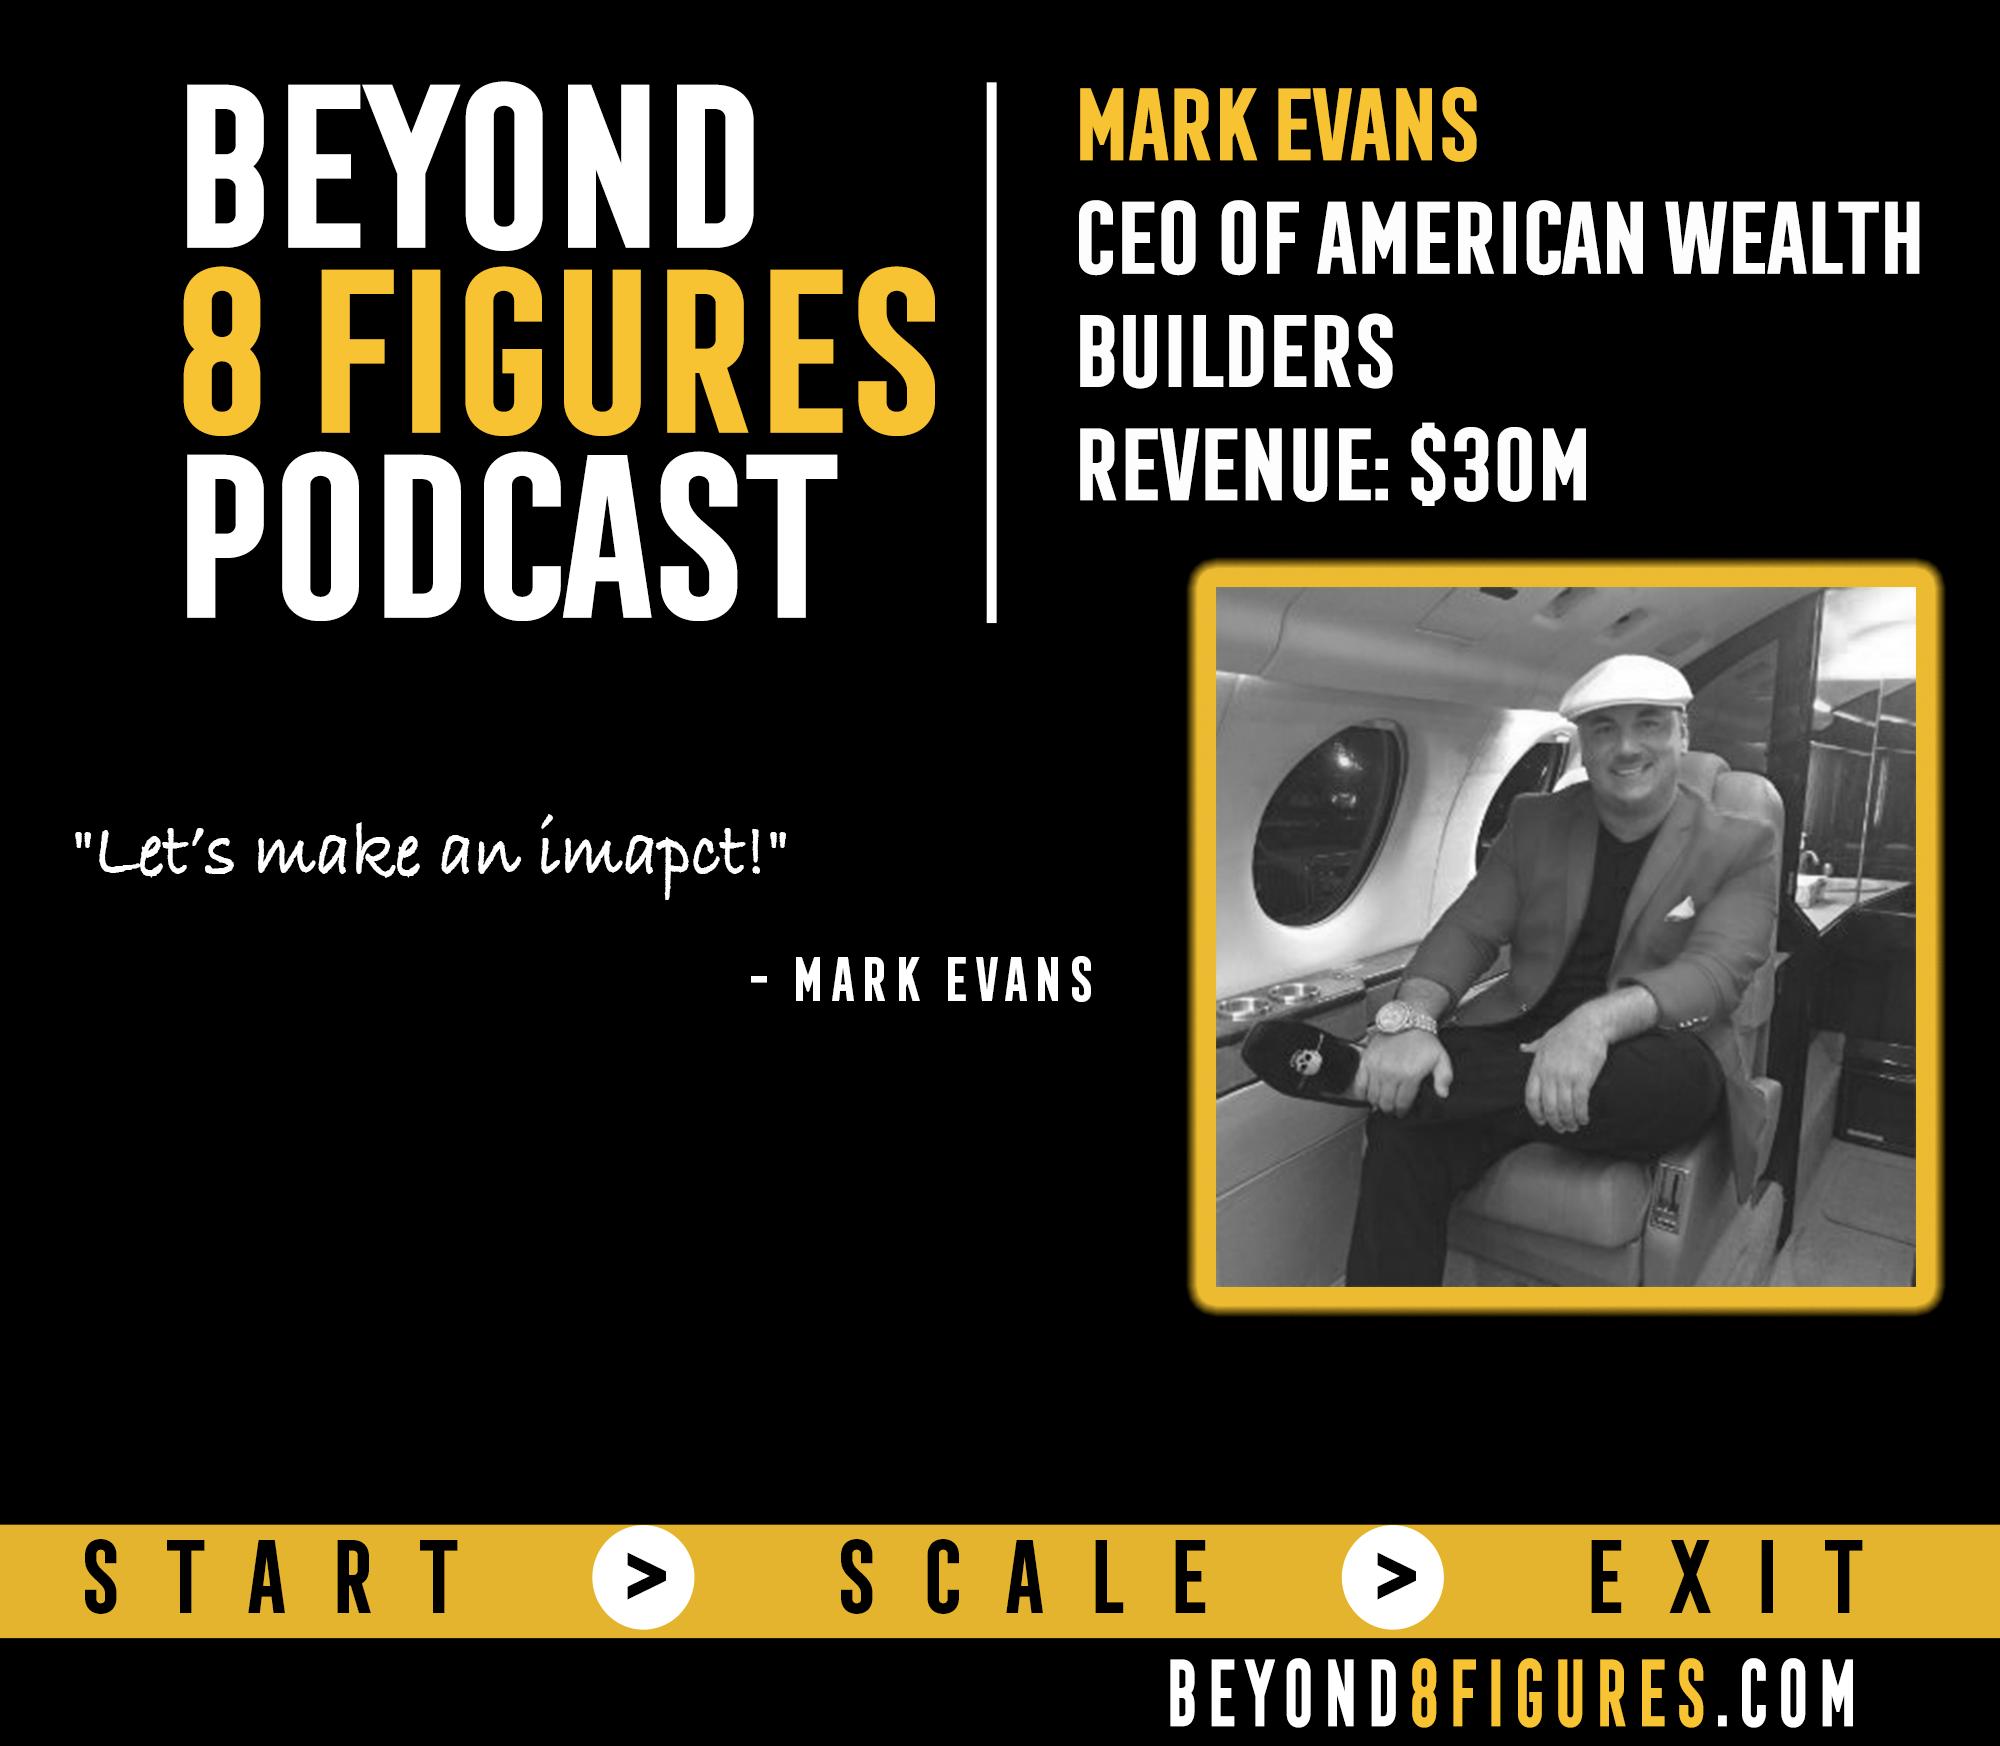 $30M in annual revenue – Mark Evans, American Wealth Builders, Cash Flow Lead Gen